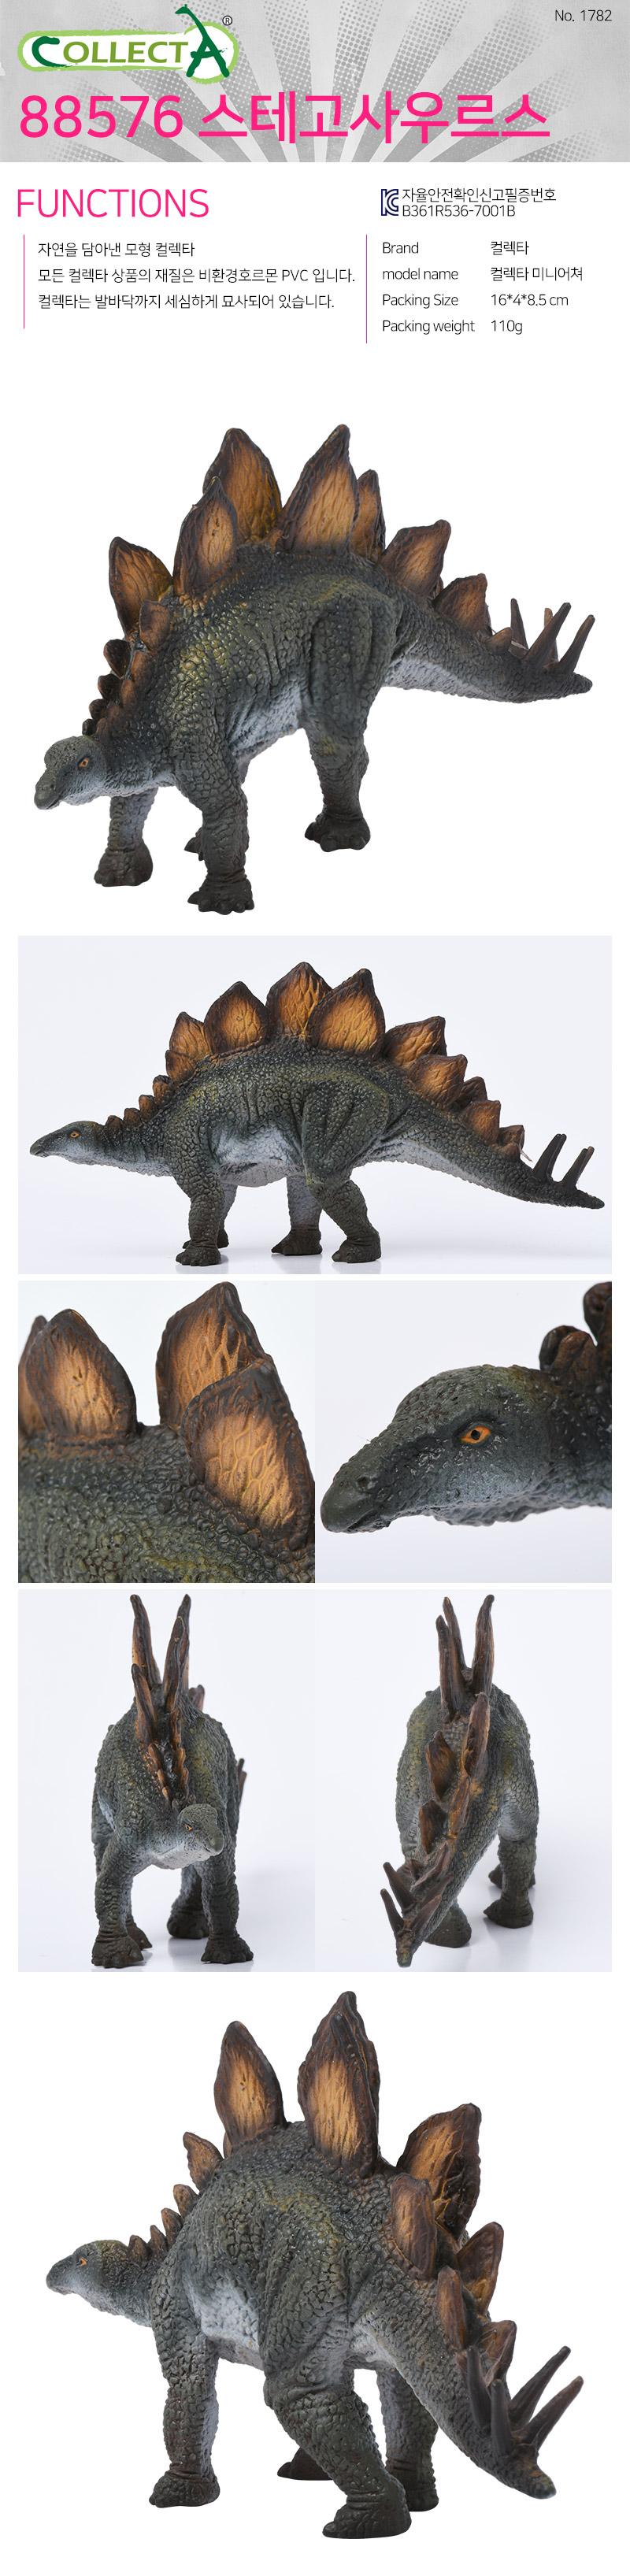 Toys & Hobbies Stegosaurus 16 Cm Dinosaur Collecta 88576 Action Figures